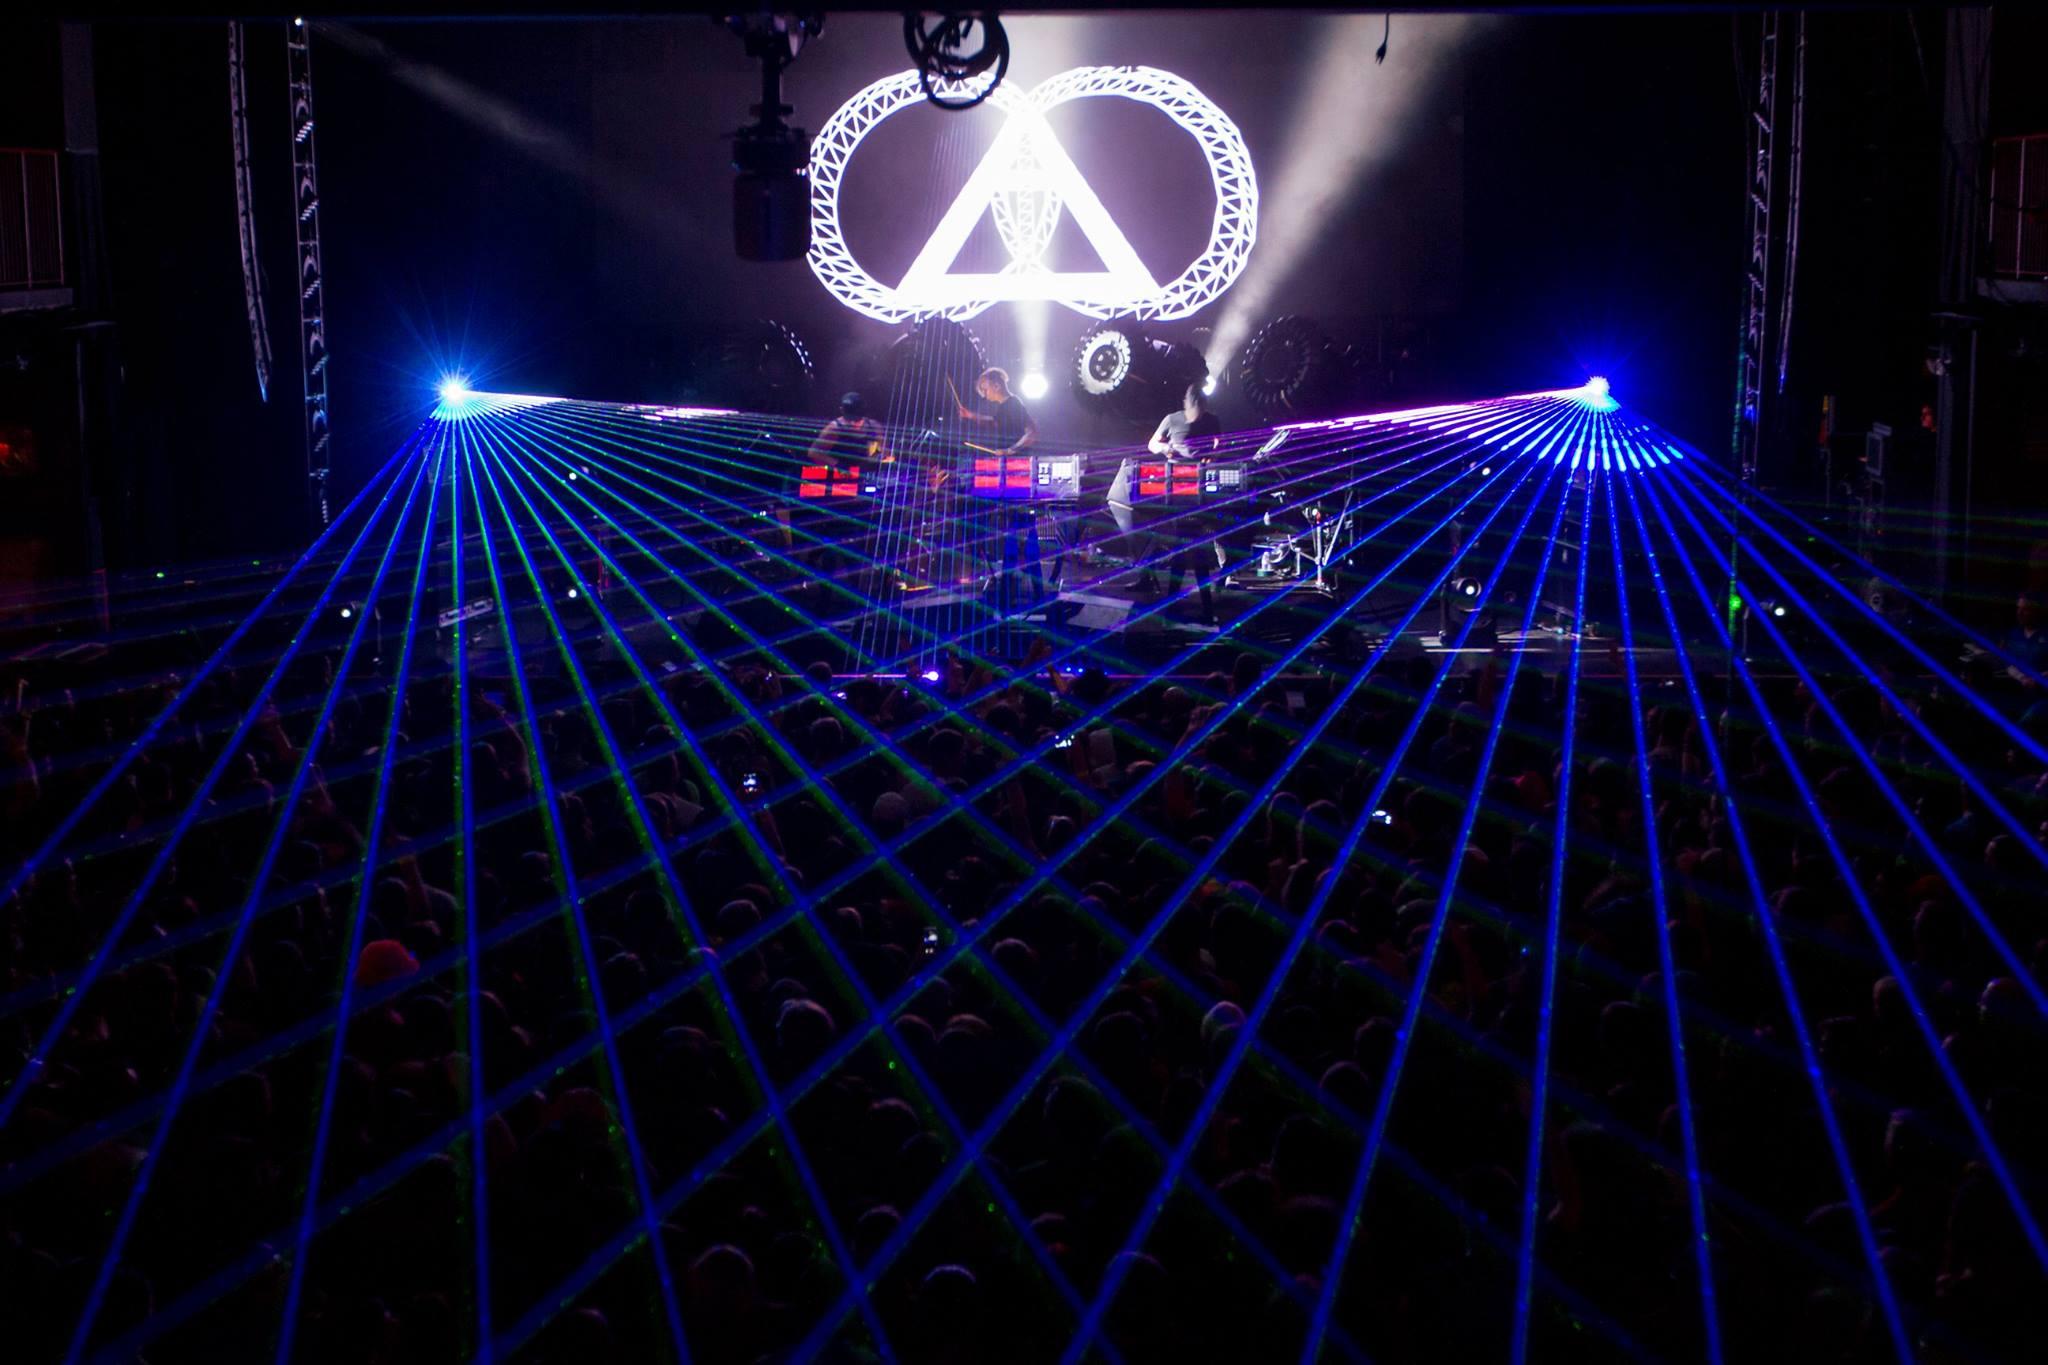 GLITCH MOB Laser Beam Show